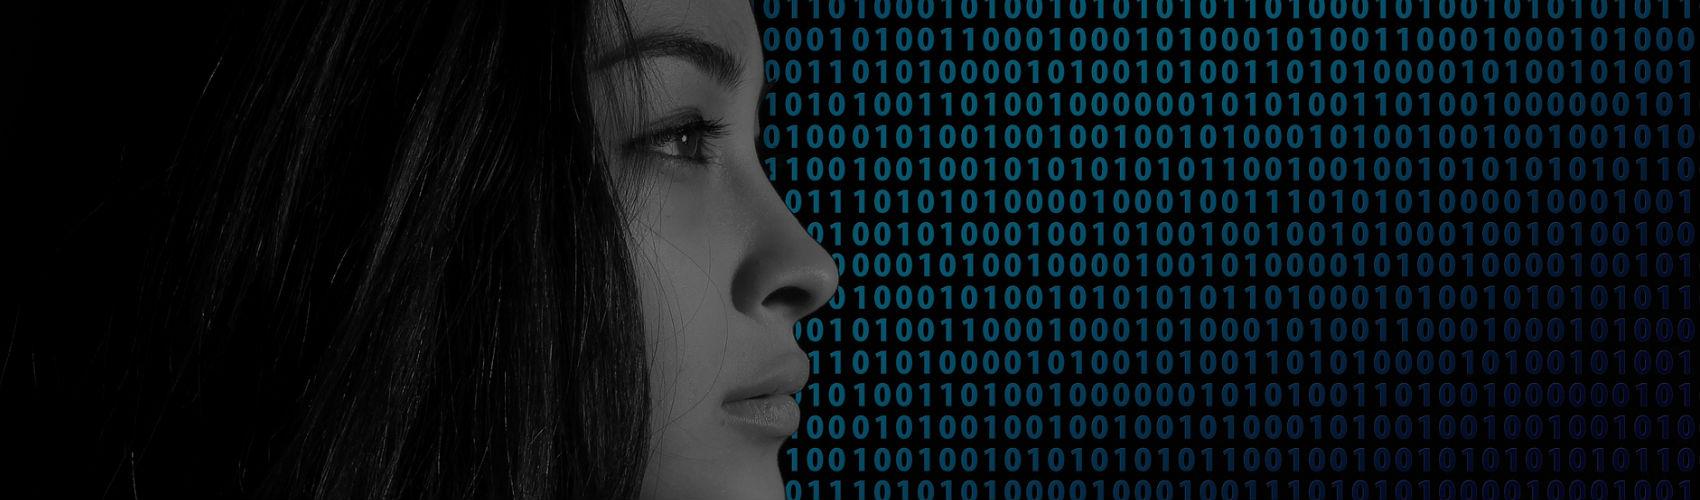 Machine Translation vs Human Translation – The Marketing Perspective